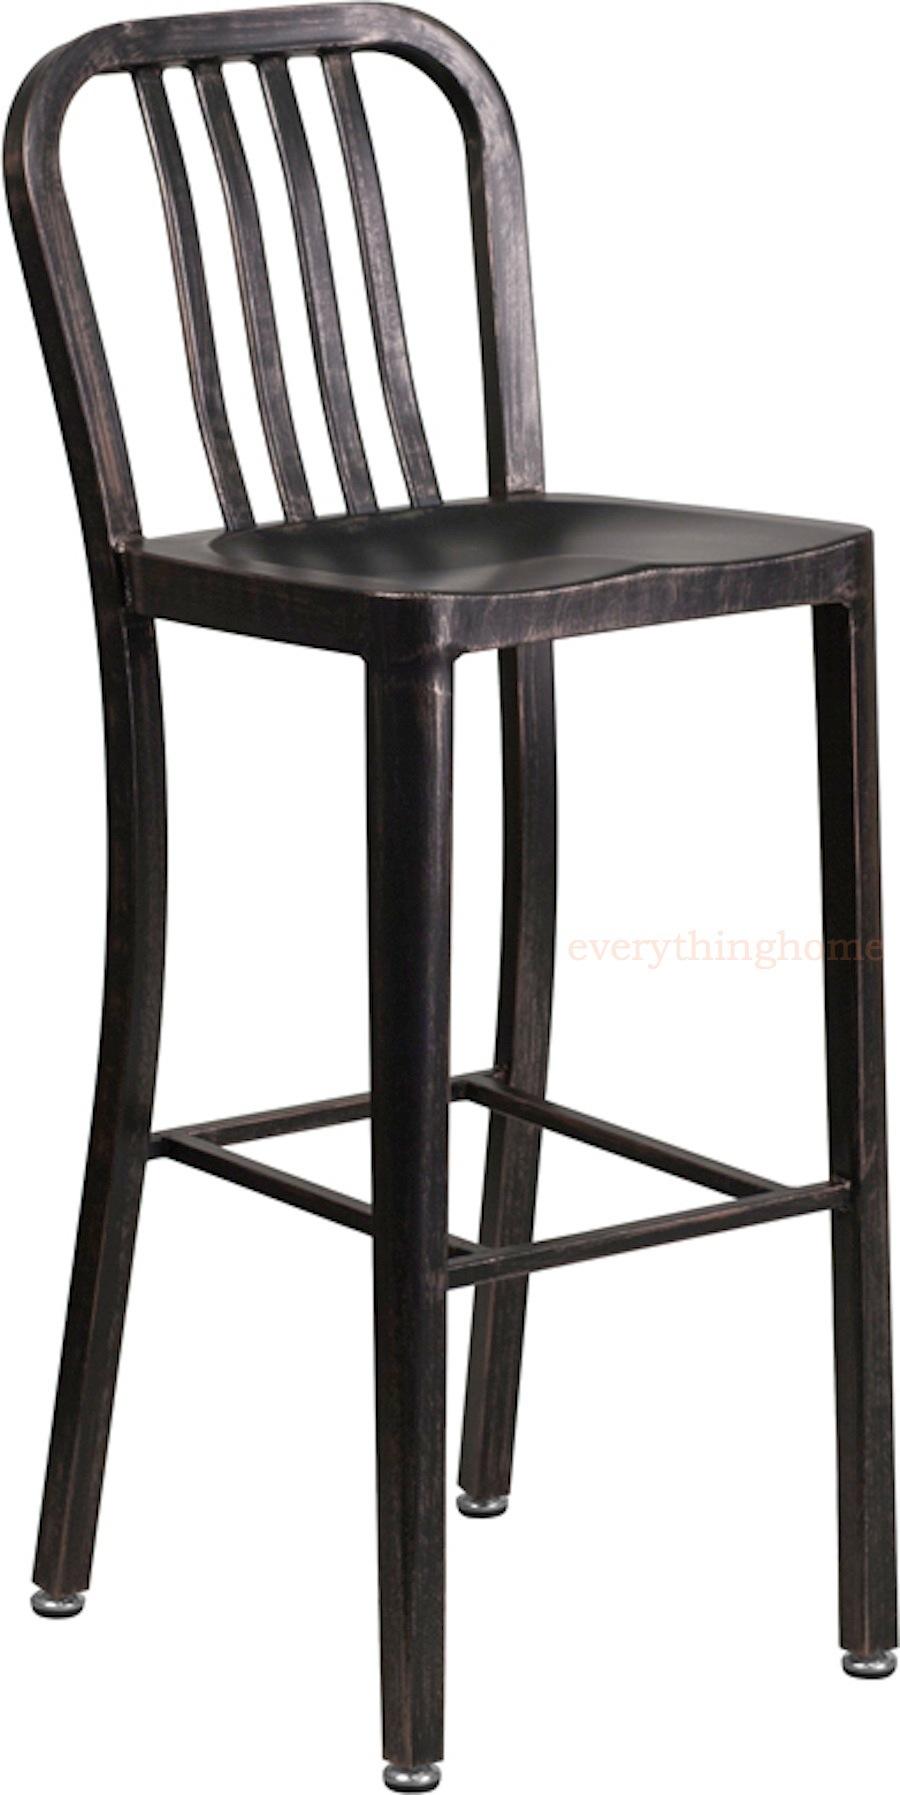 Bar Stool High Top Cafe Patio Chair